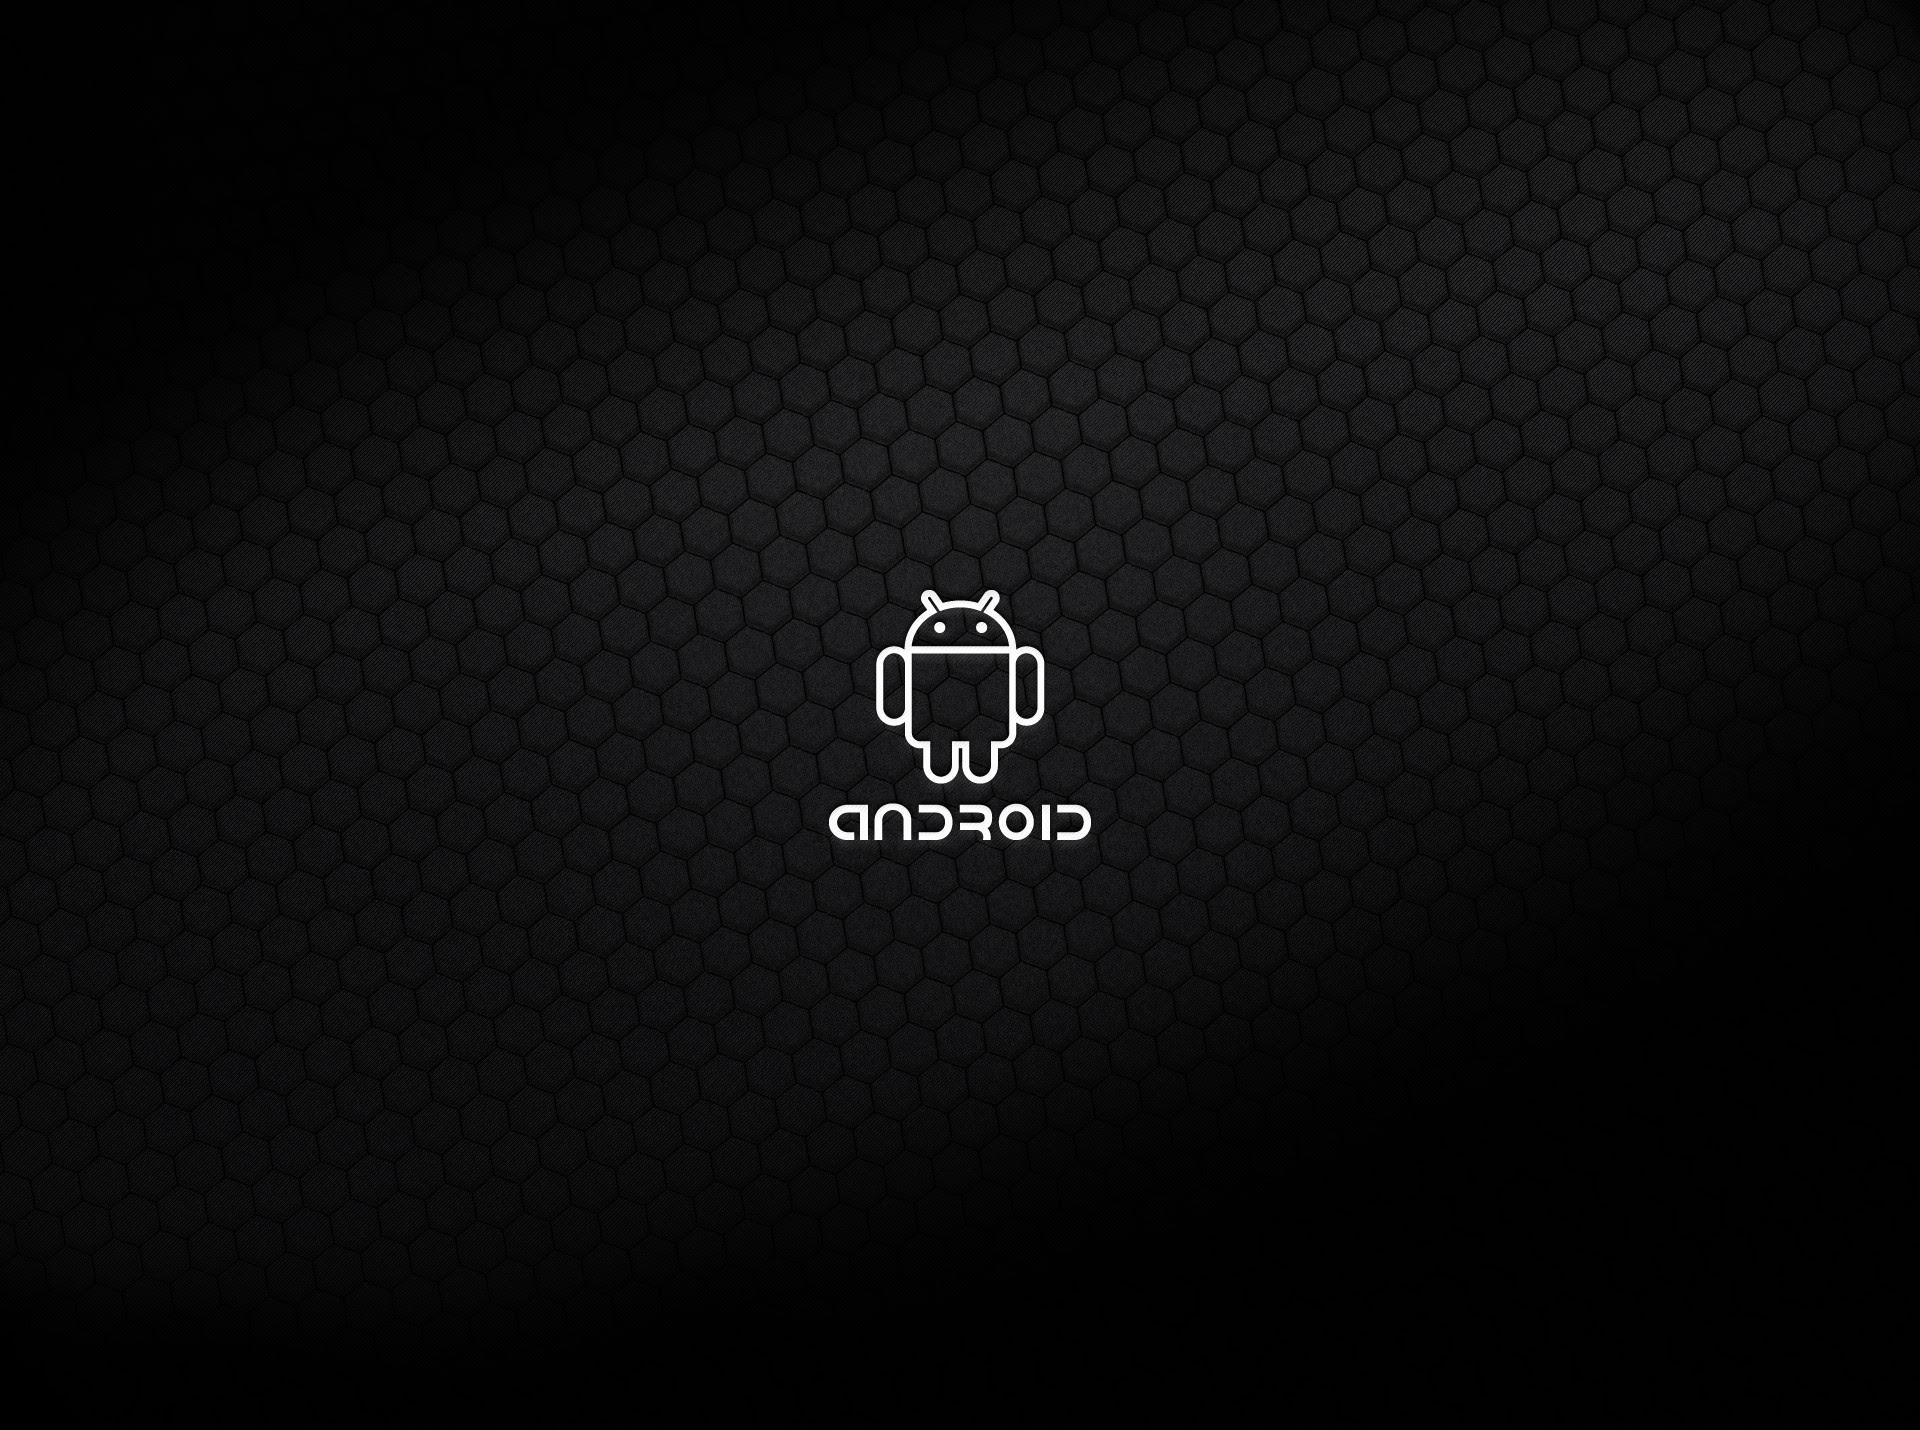 Unduh 7800 Koleksi Wallpaper Black White Android HD Terbaru